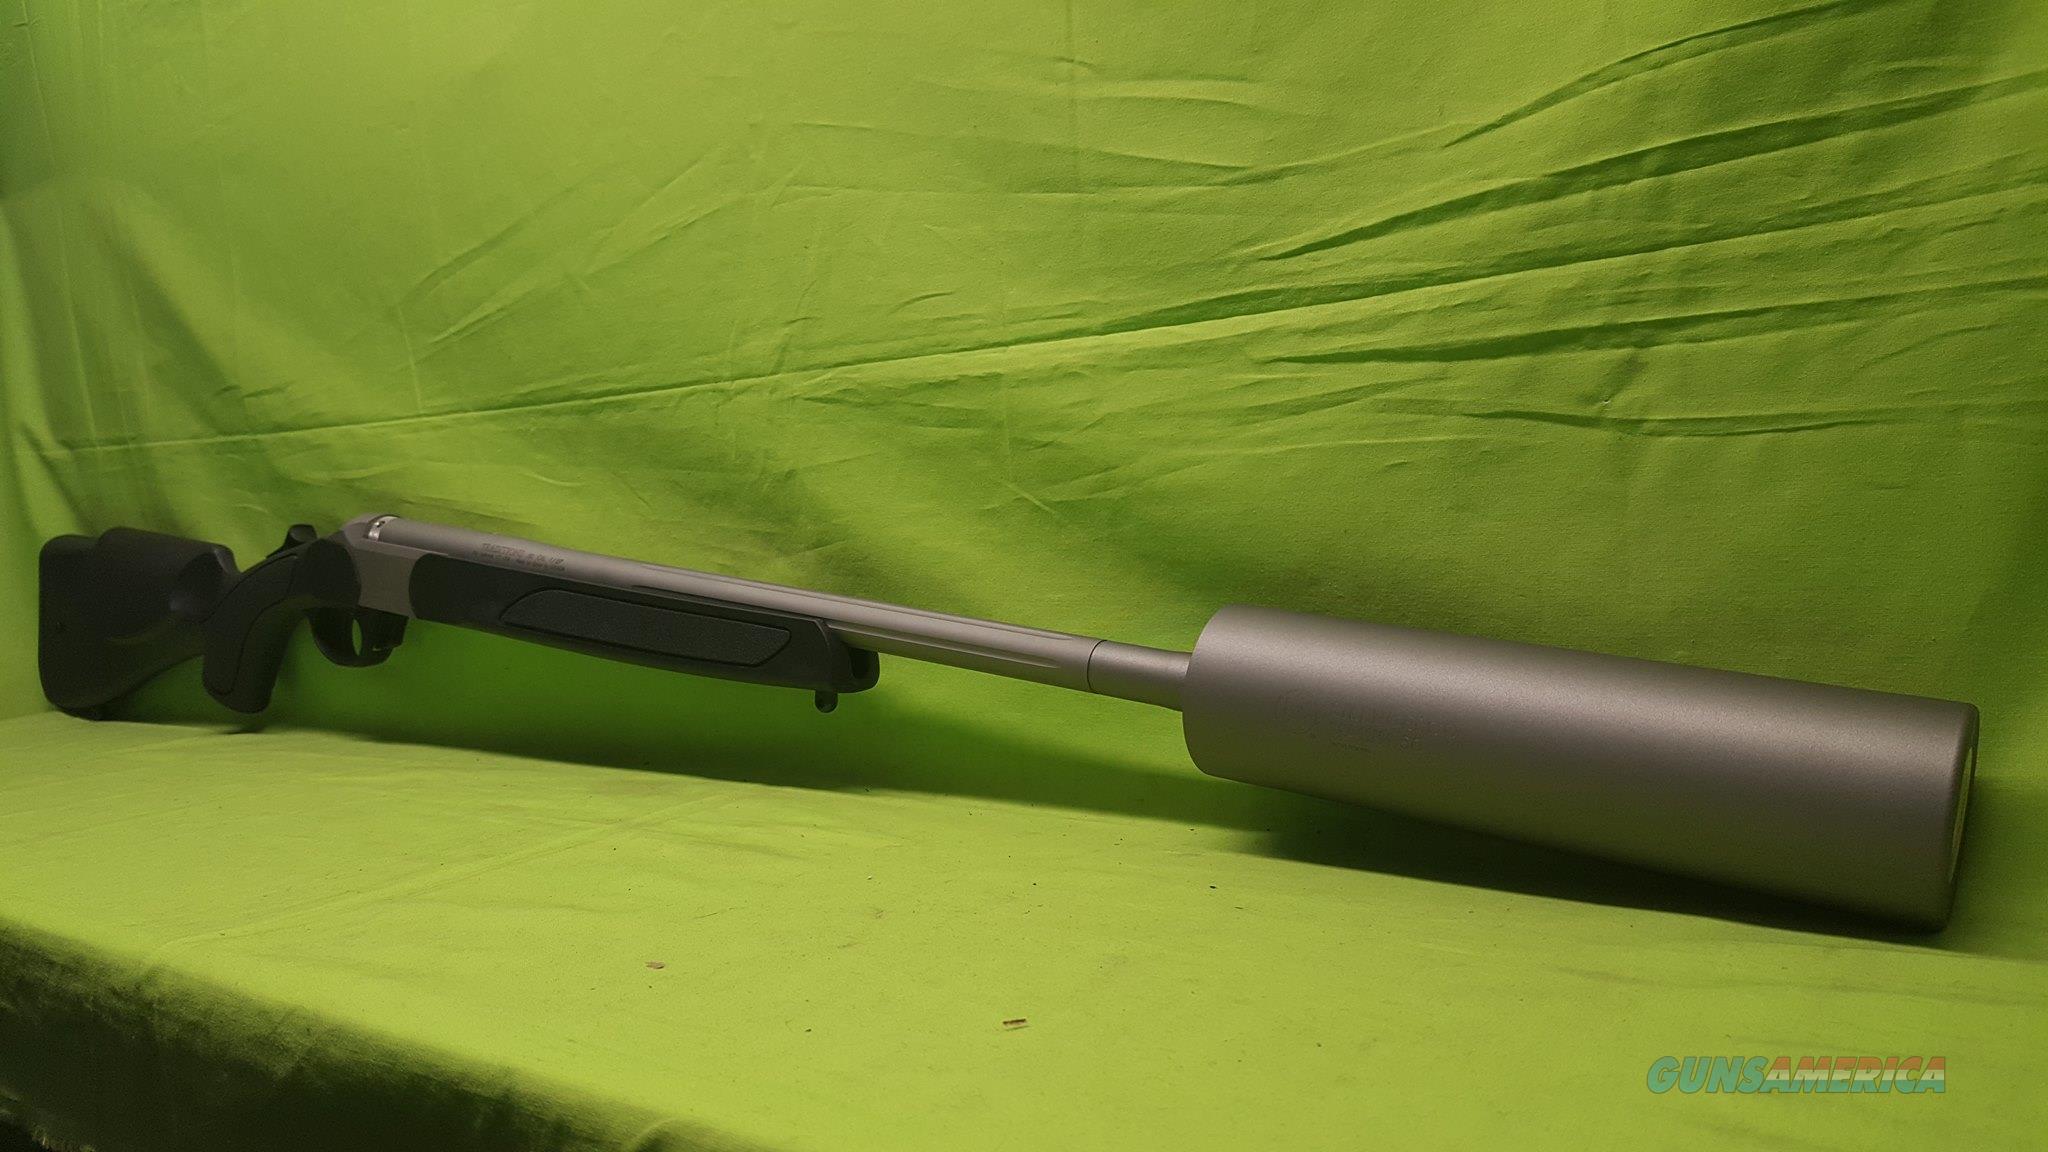 SILENCERCO MAXIM 50 CAL MUZZLELOADER NONNFA AC2421  Non-Guns > Black Powder Muzzleloading